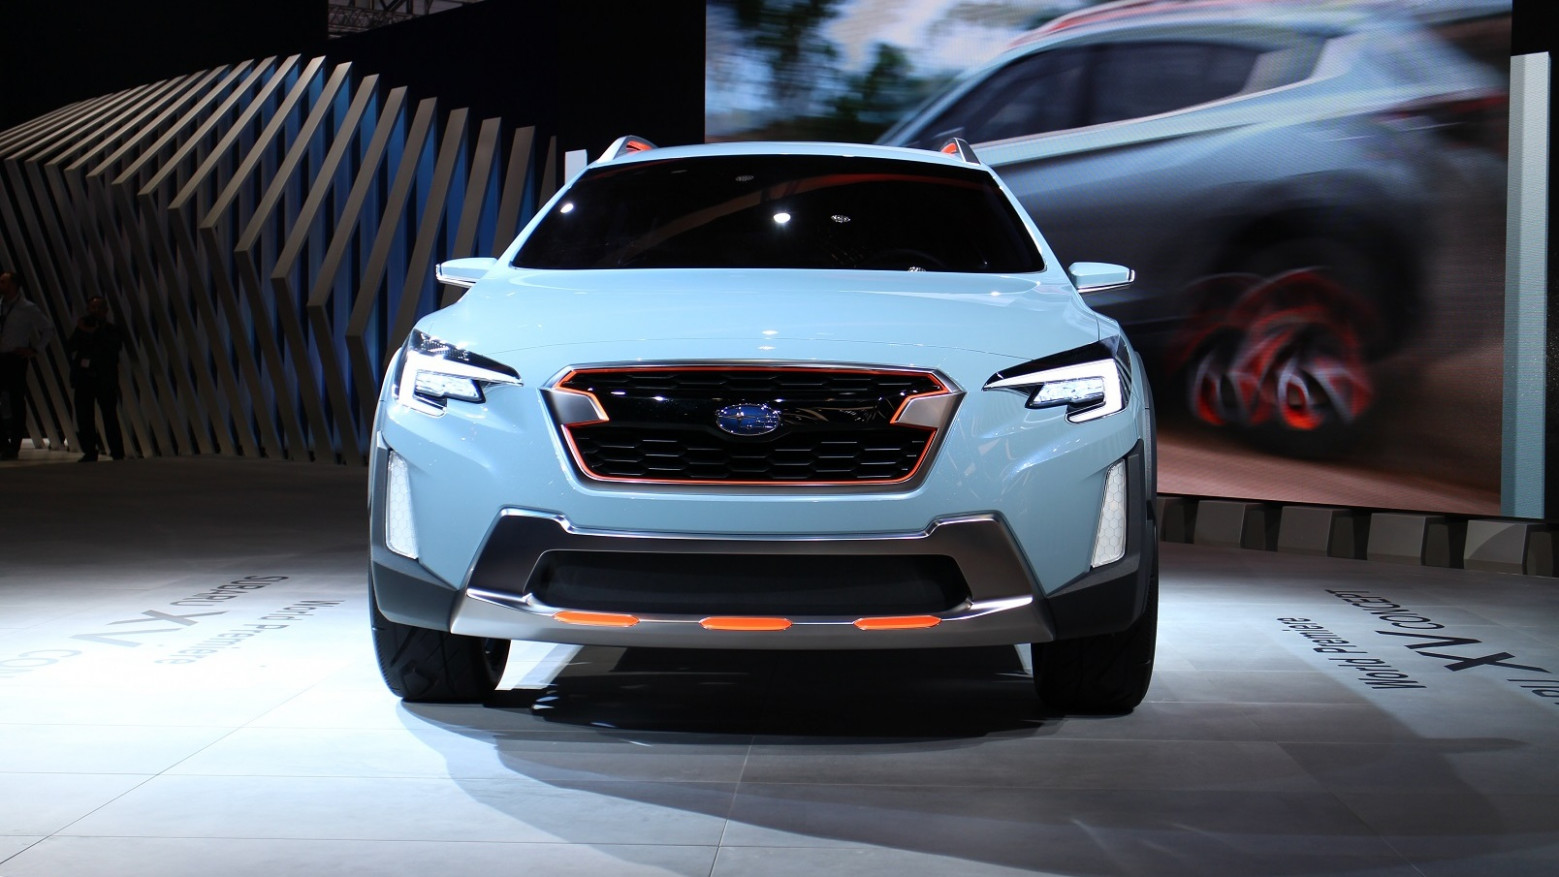 New Concept Subaru Xv Hybrid 2022